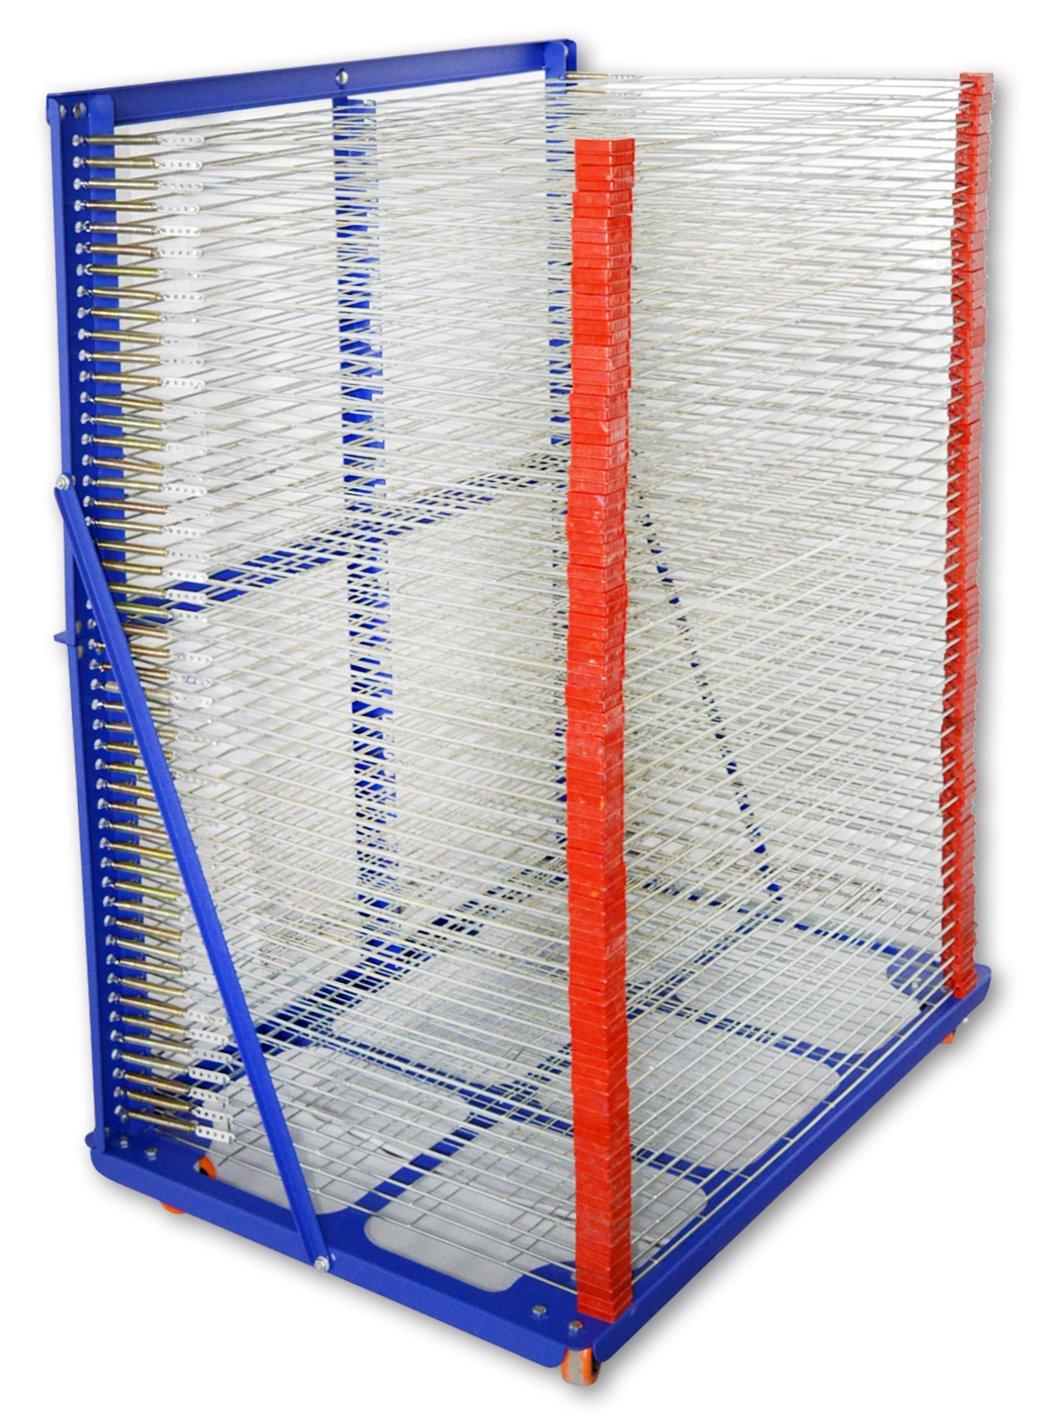 Screen Drying Rack Assembling Type - Equipment for Silk Screen Printing by Screen Printing Equipment